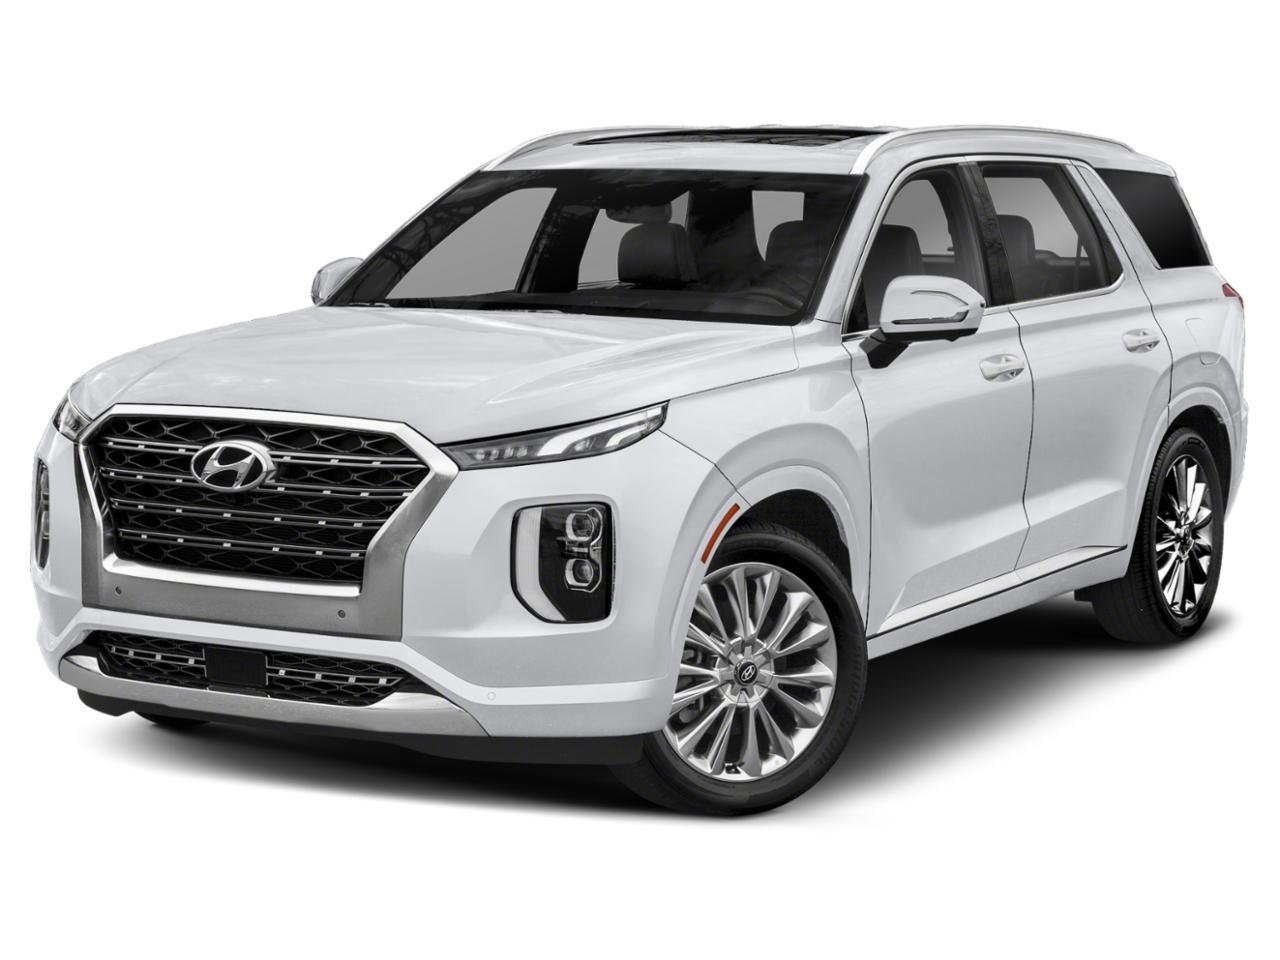 2020 Hyundai Palisade Vehicle Photo in Fayetteville, NC 28303